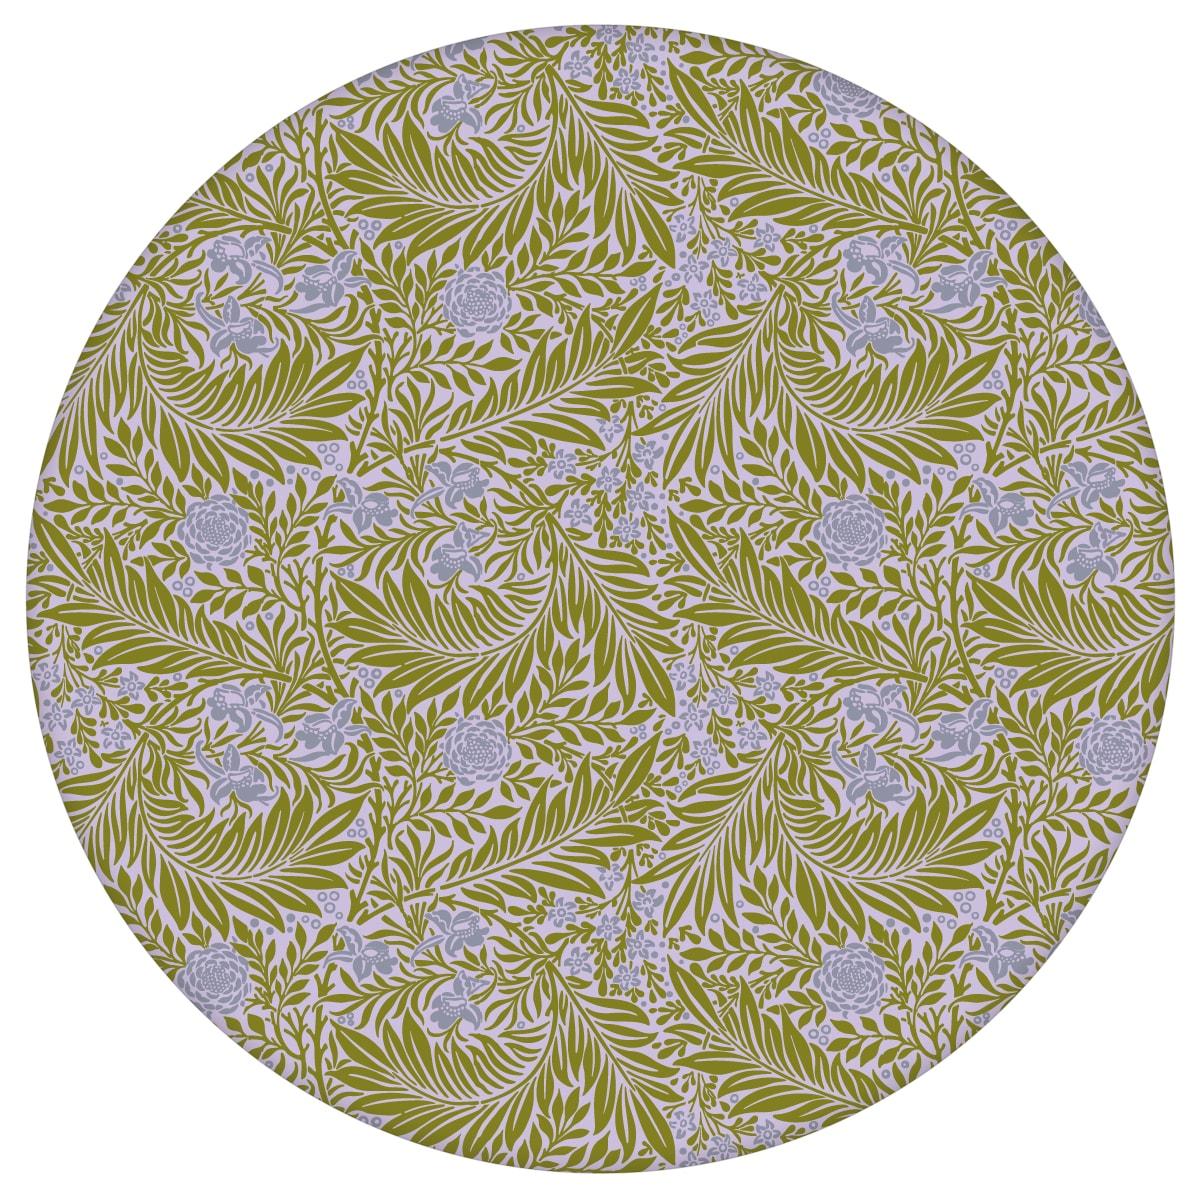 "Retro Jugendstil Tapete ""Délice florale"" nach William Morris, lila olive Vlies-Tapete kleiner Rapport für Schlafzimmeraus dem GMM-BERLIN.com Sortiment: blaue Tapete zur Raumgestaltung: #00177 #beige #beige – cremefarbene Tapeten #Blaue Tapeten #blumen #Blumentapete #dunkelblau #Jugendstil #Natur #ornamente #Ranken #Retro #schlafzimmer #vintage #WilliamMorris für individuelles Interiordesign"